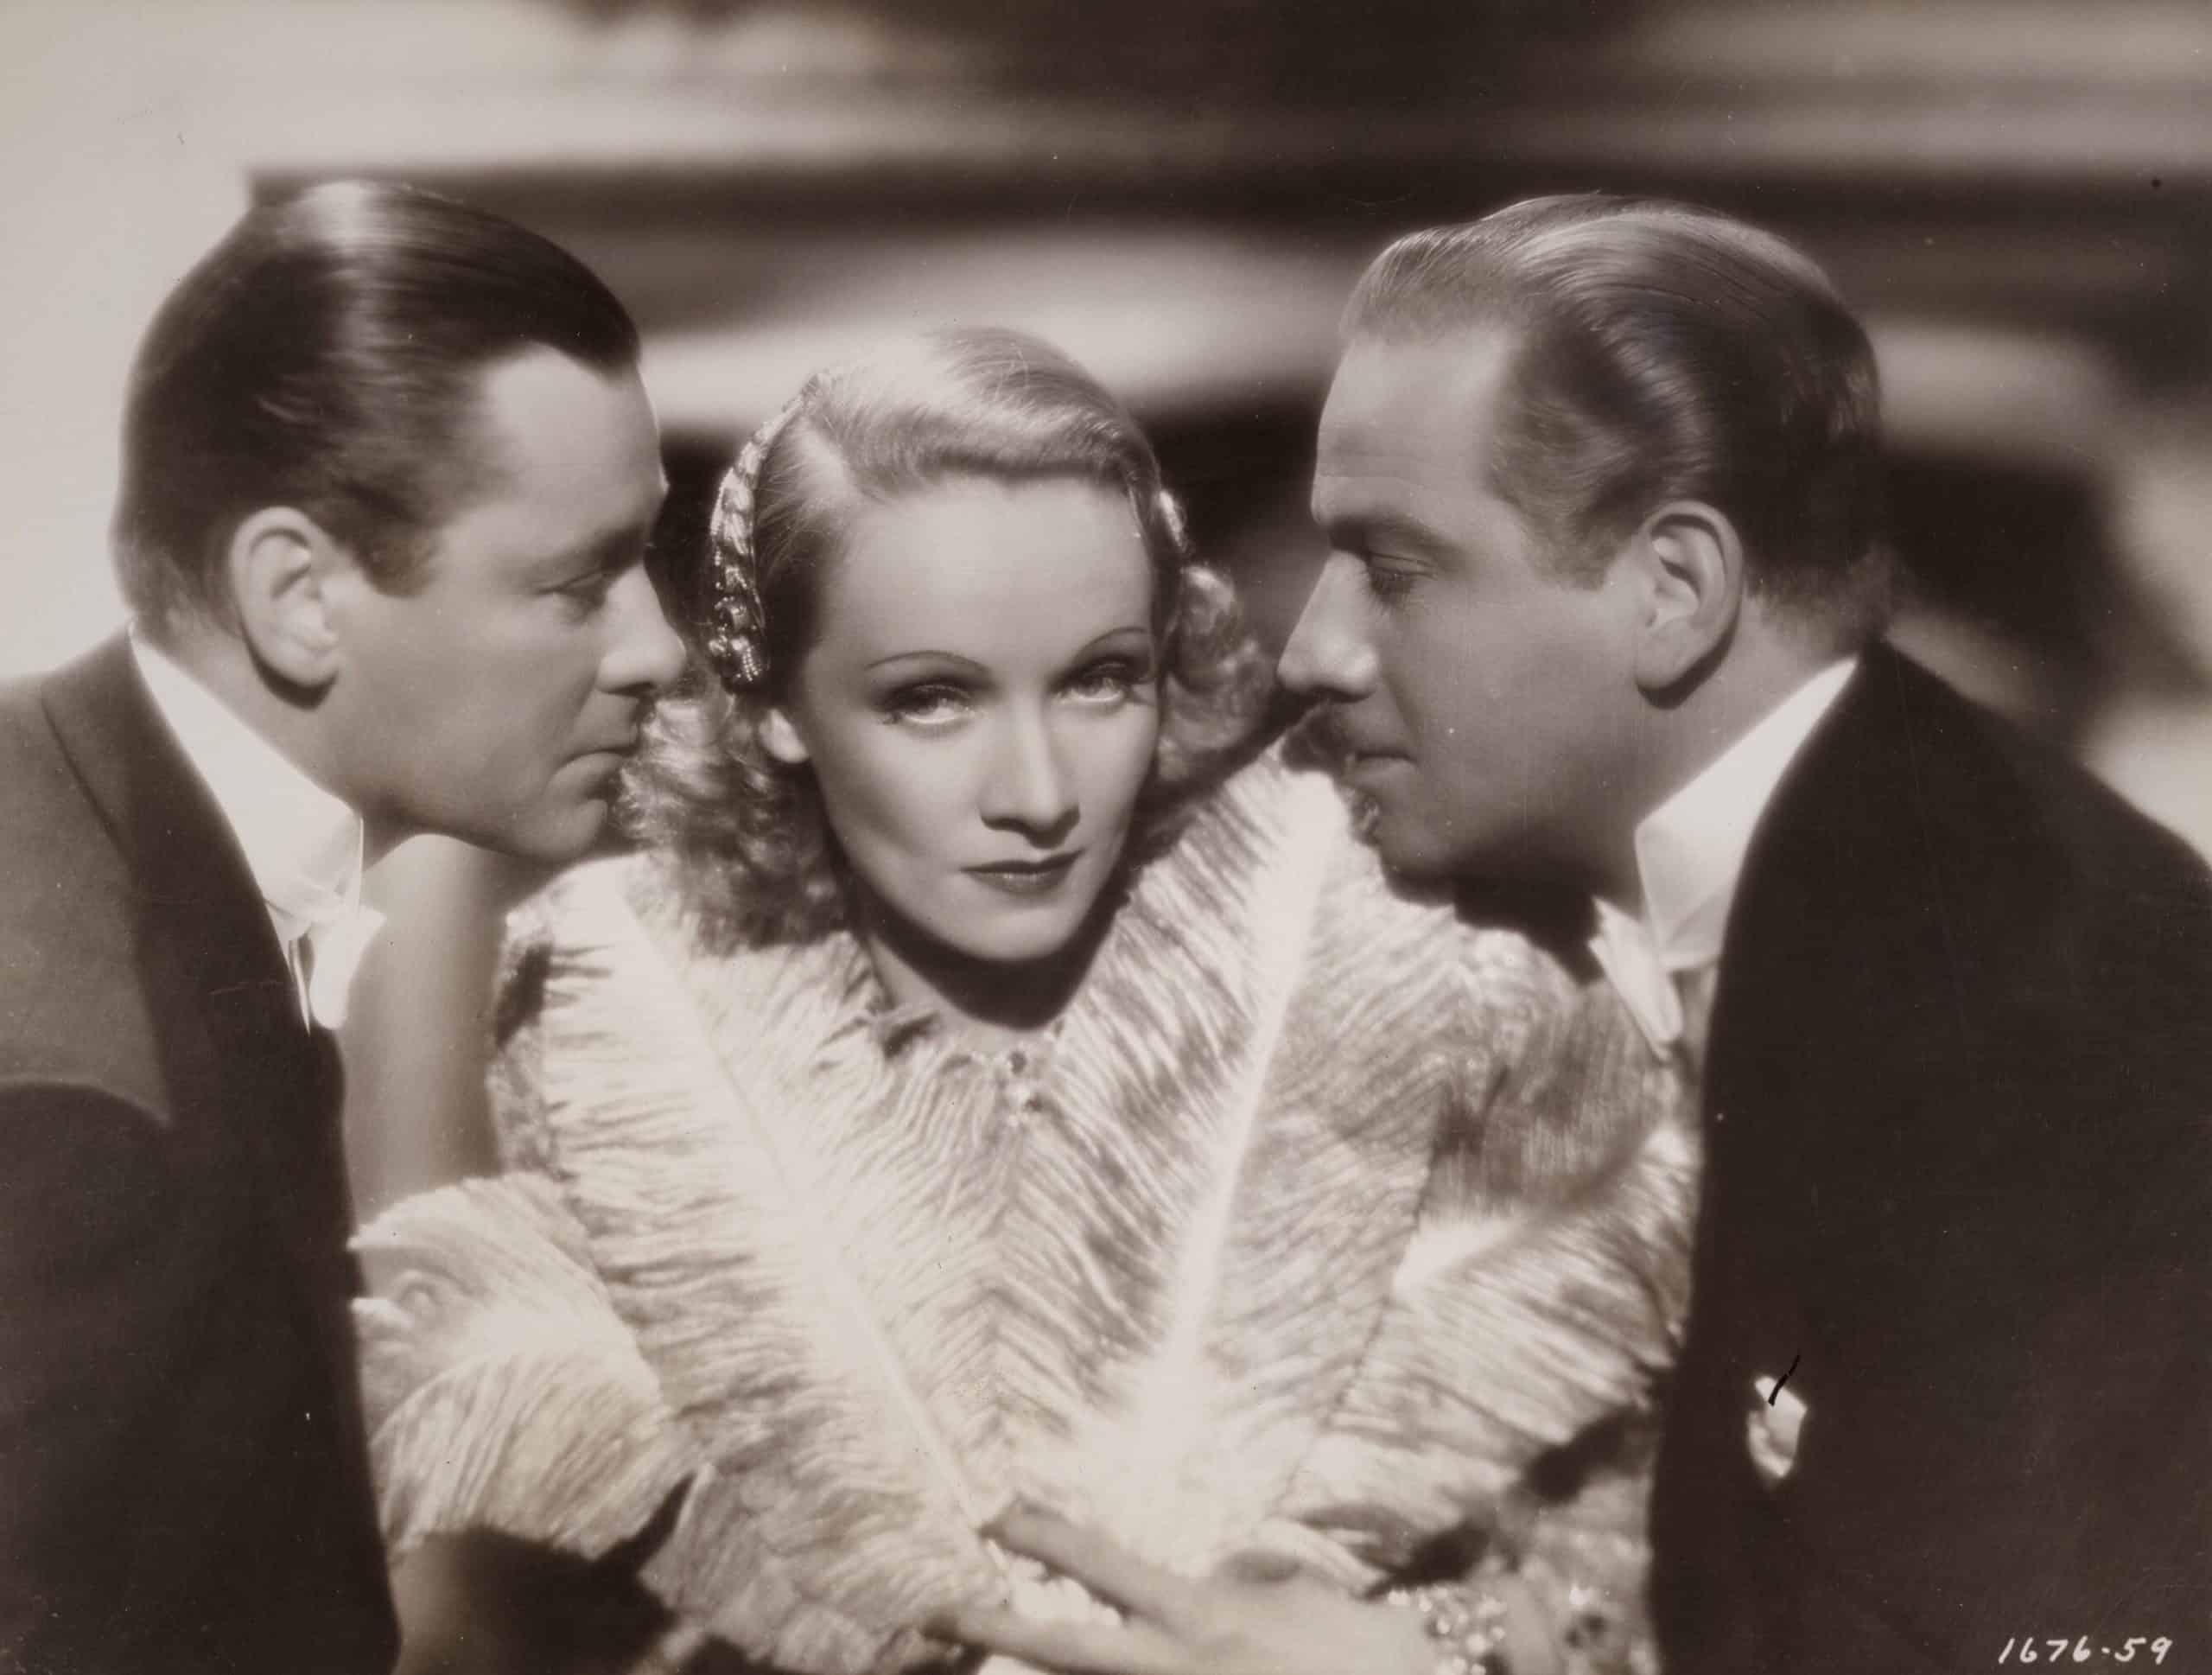 Herbert Marshall, Marlene Dietrich and Melvyn Douglass. Angel. 1937. Paramount Pictures publicity still